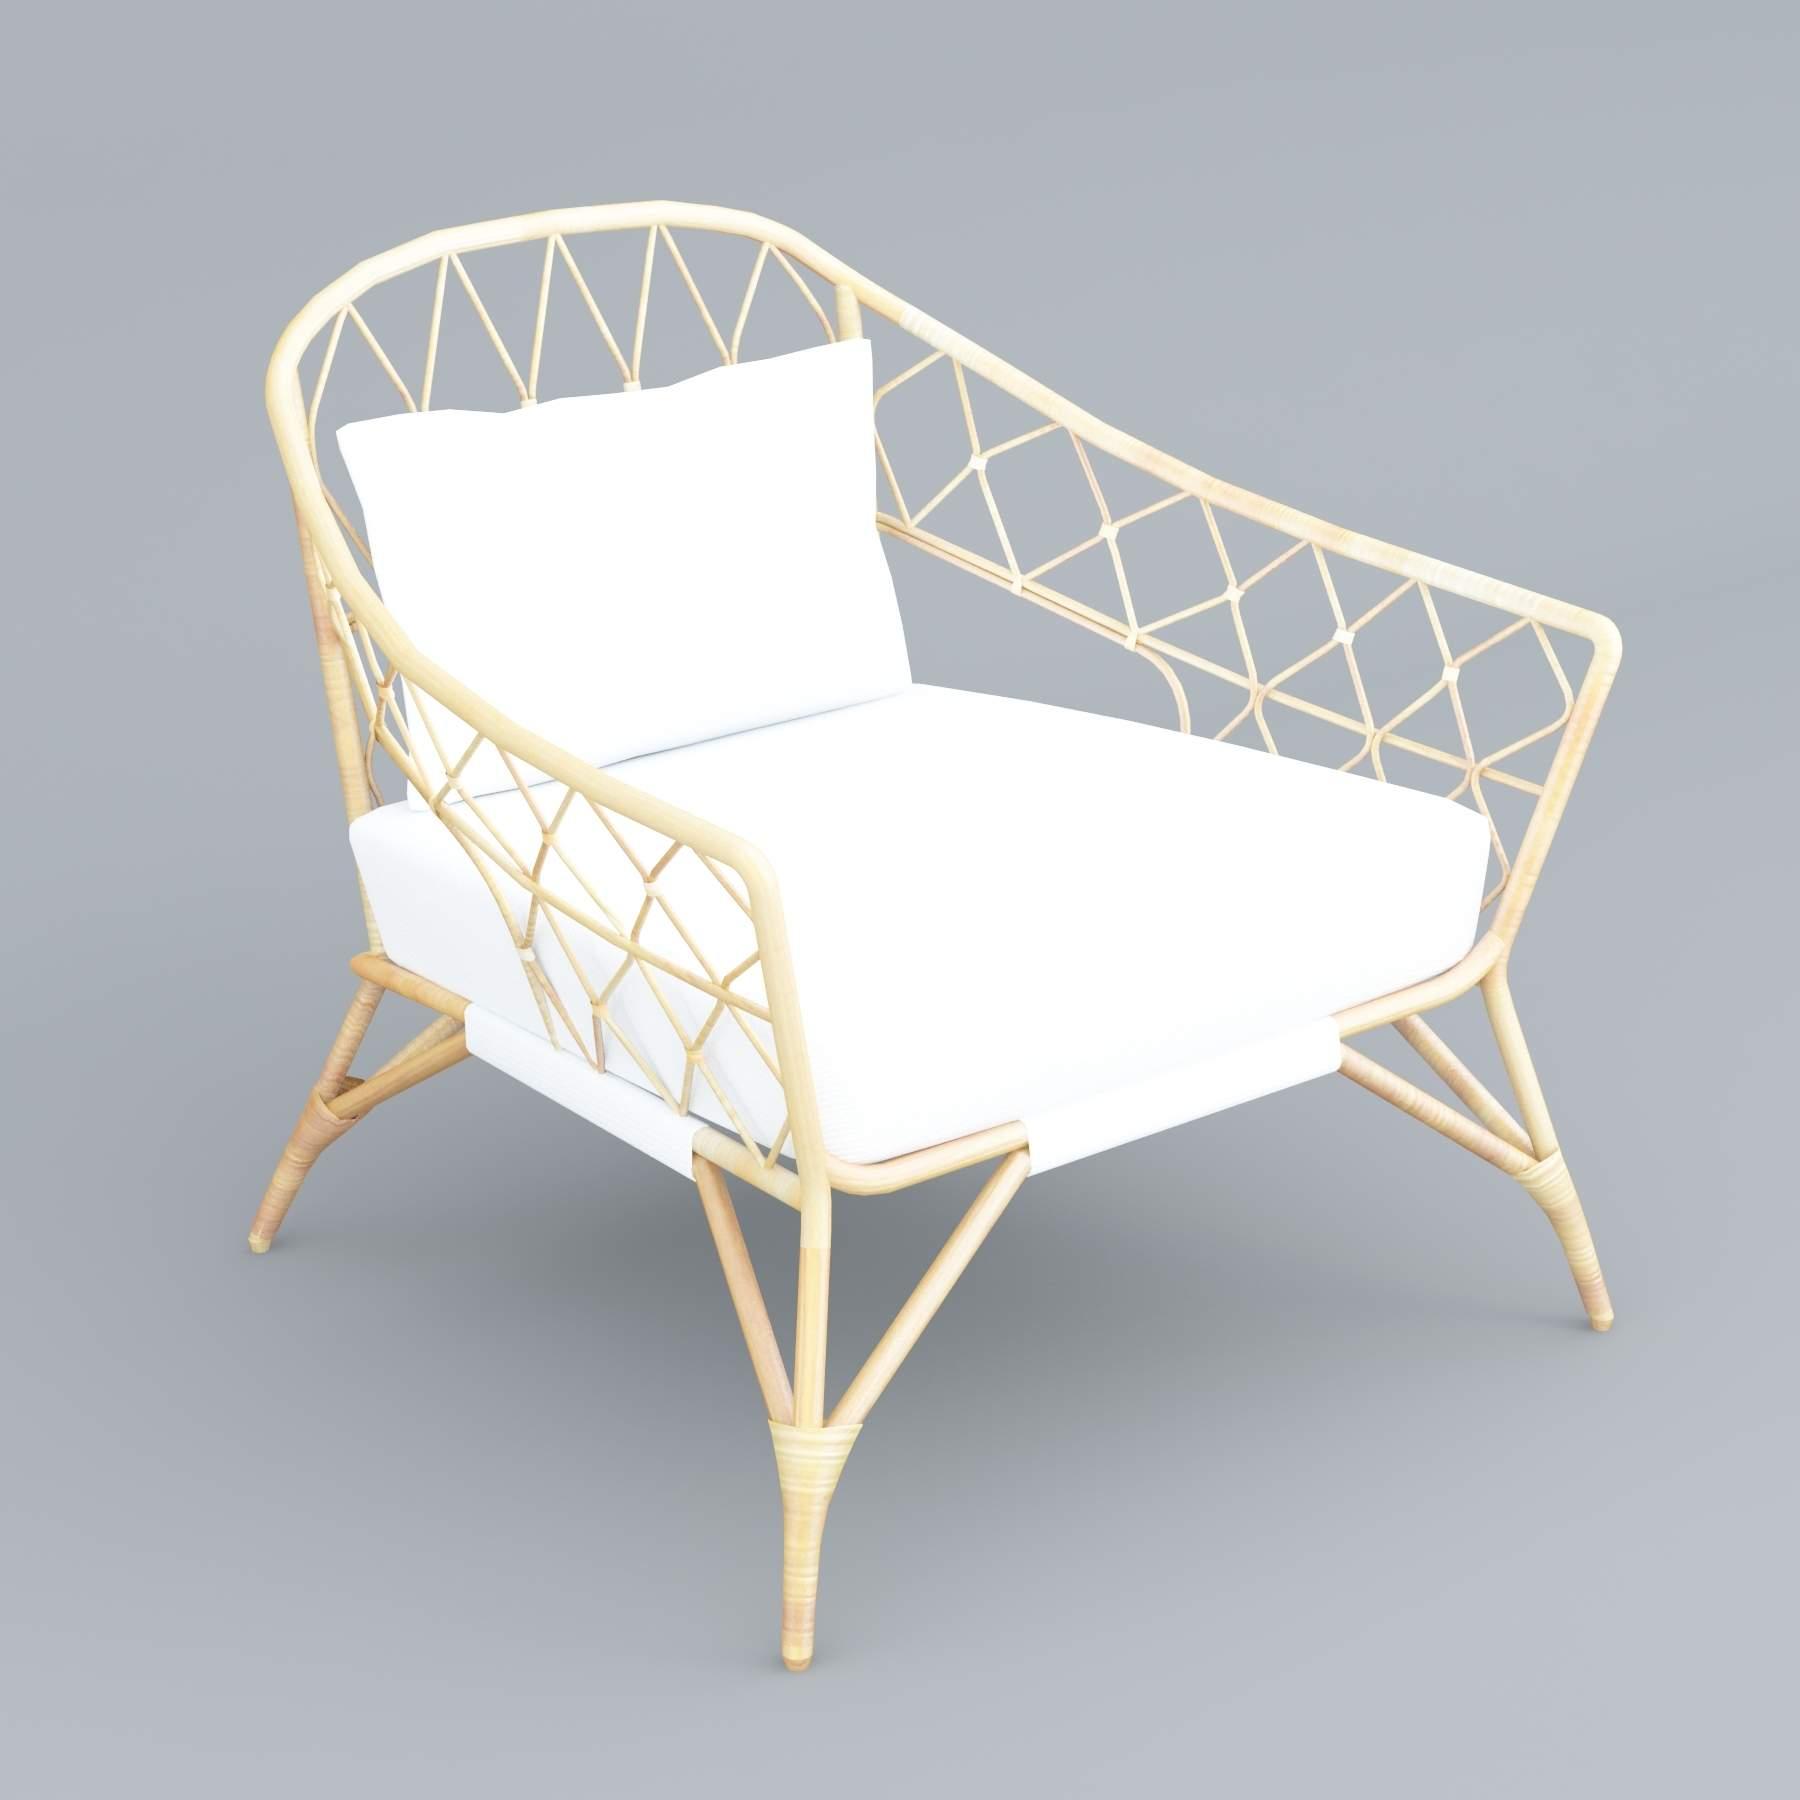 Ikea Stockholm Rattan Chair Model